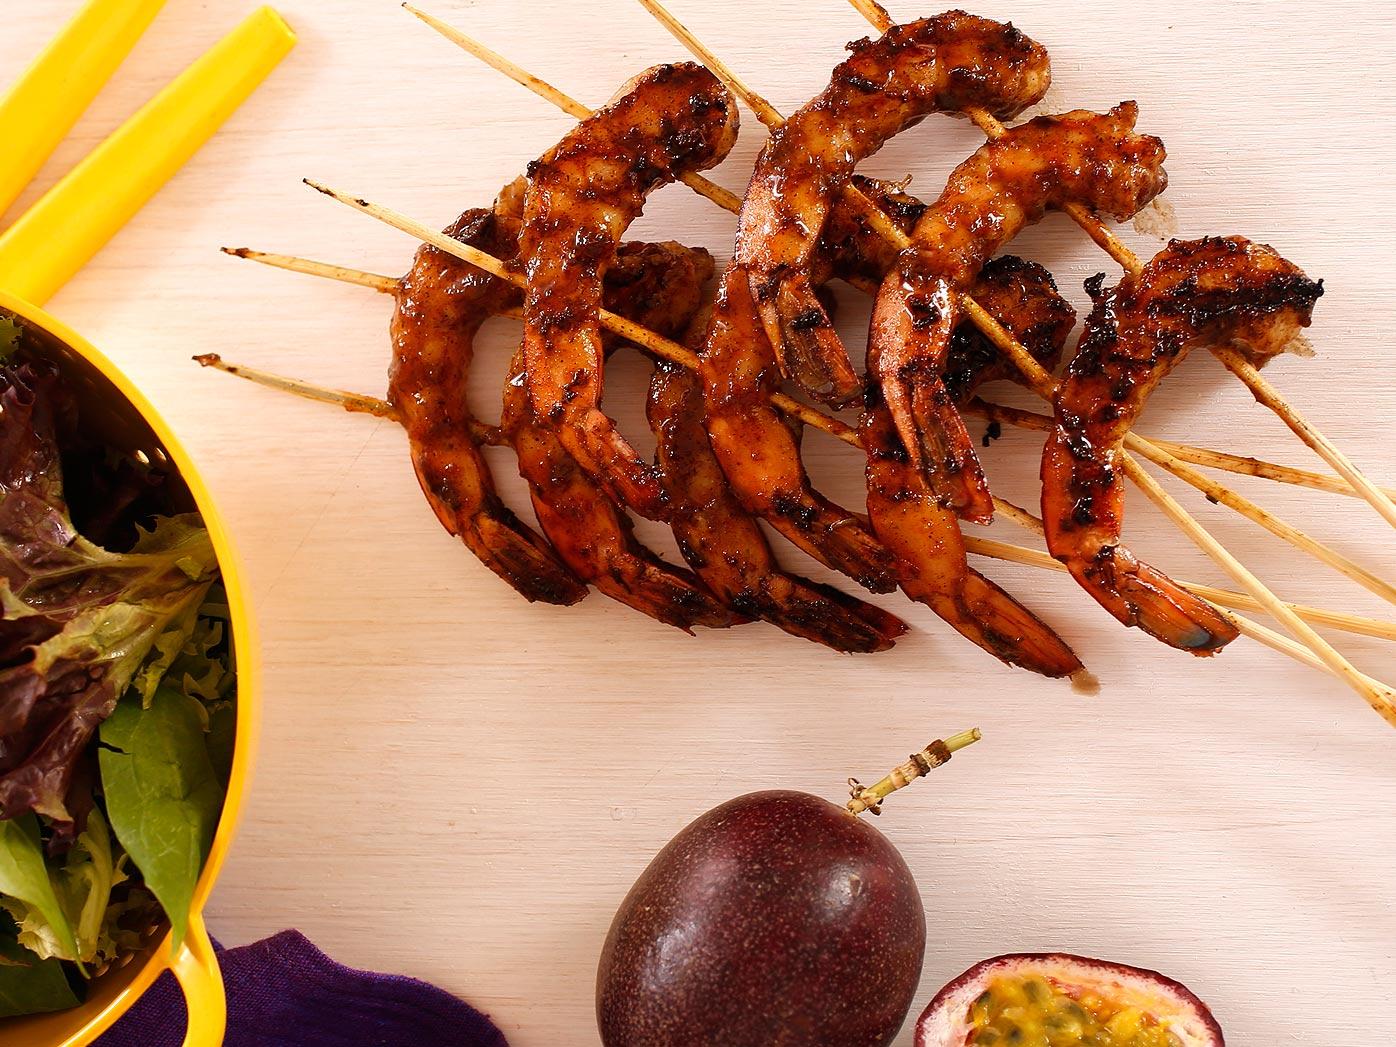 Moroccan glazed barbecue prawns